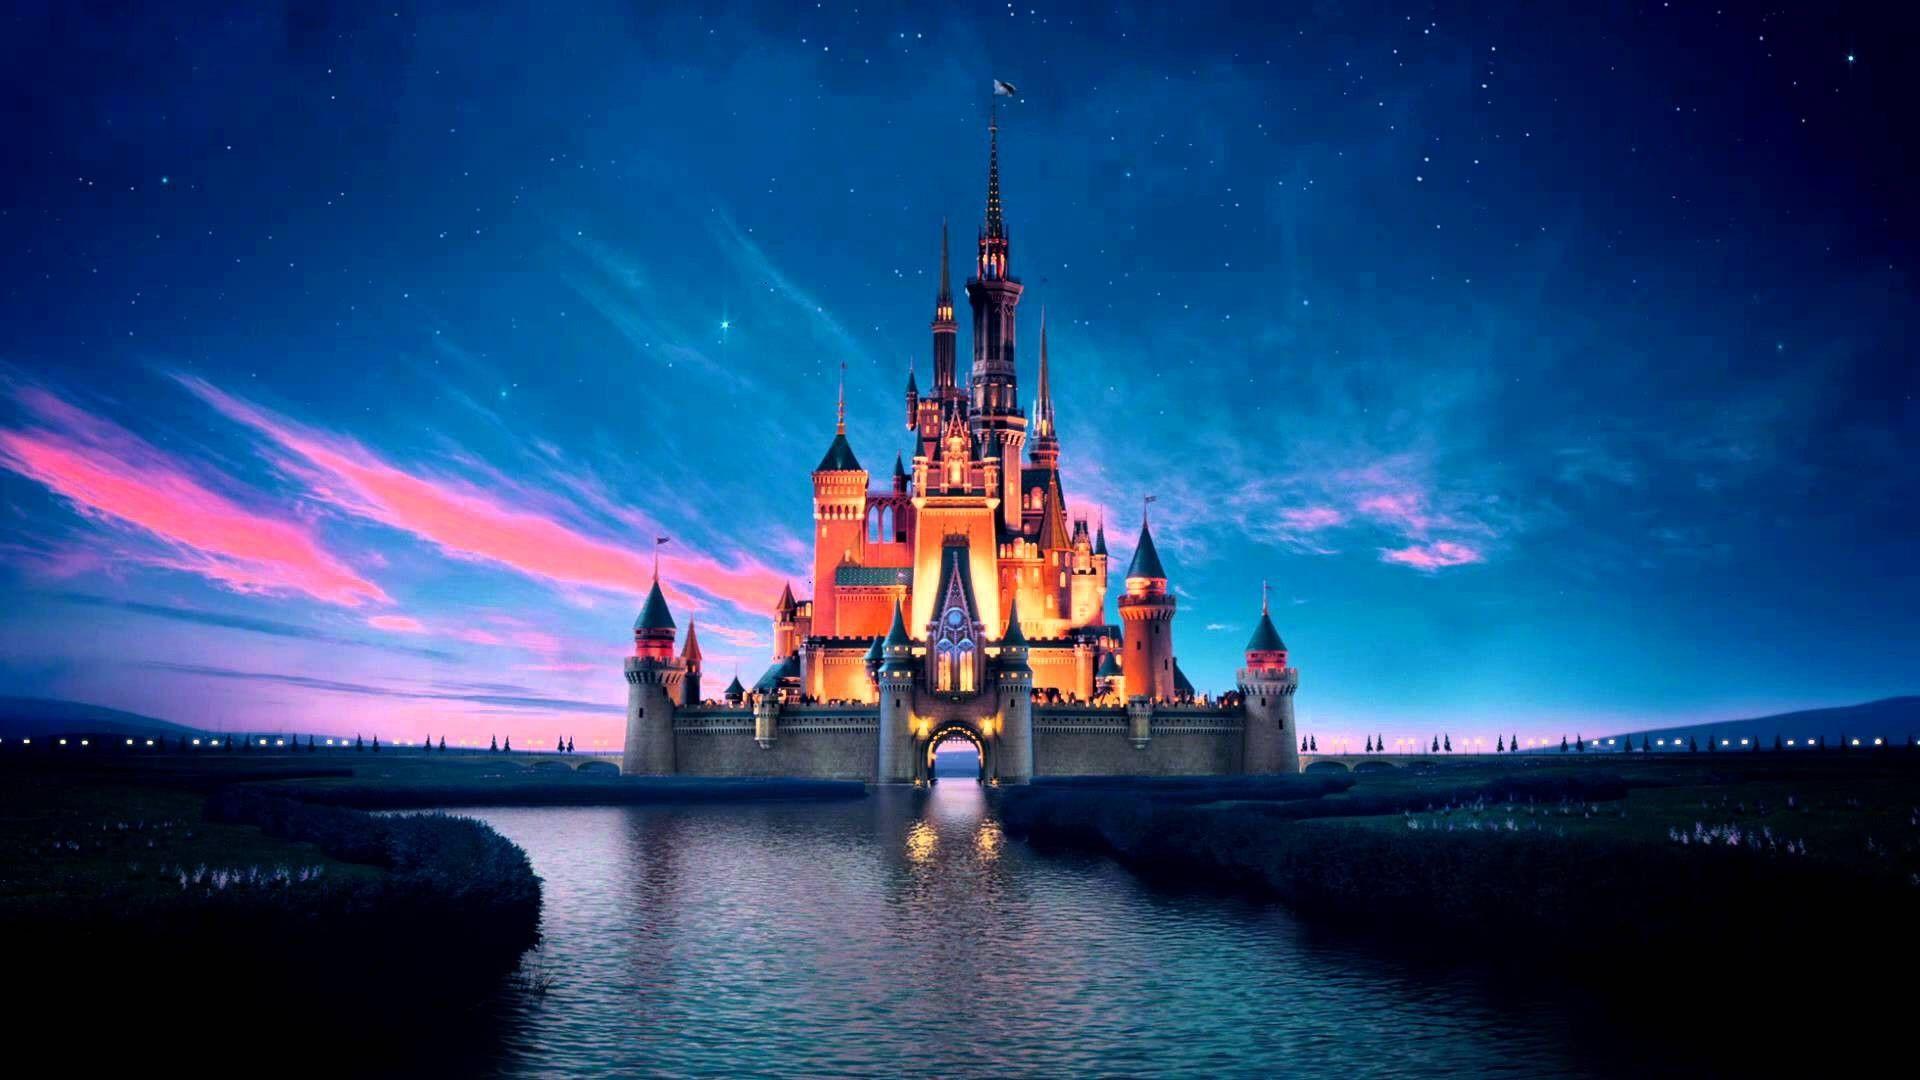 Wallpapers Del Castillo De Disney Buscar Con Google Pantalla De Computadora Disney Castle Pantalla De Laptop